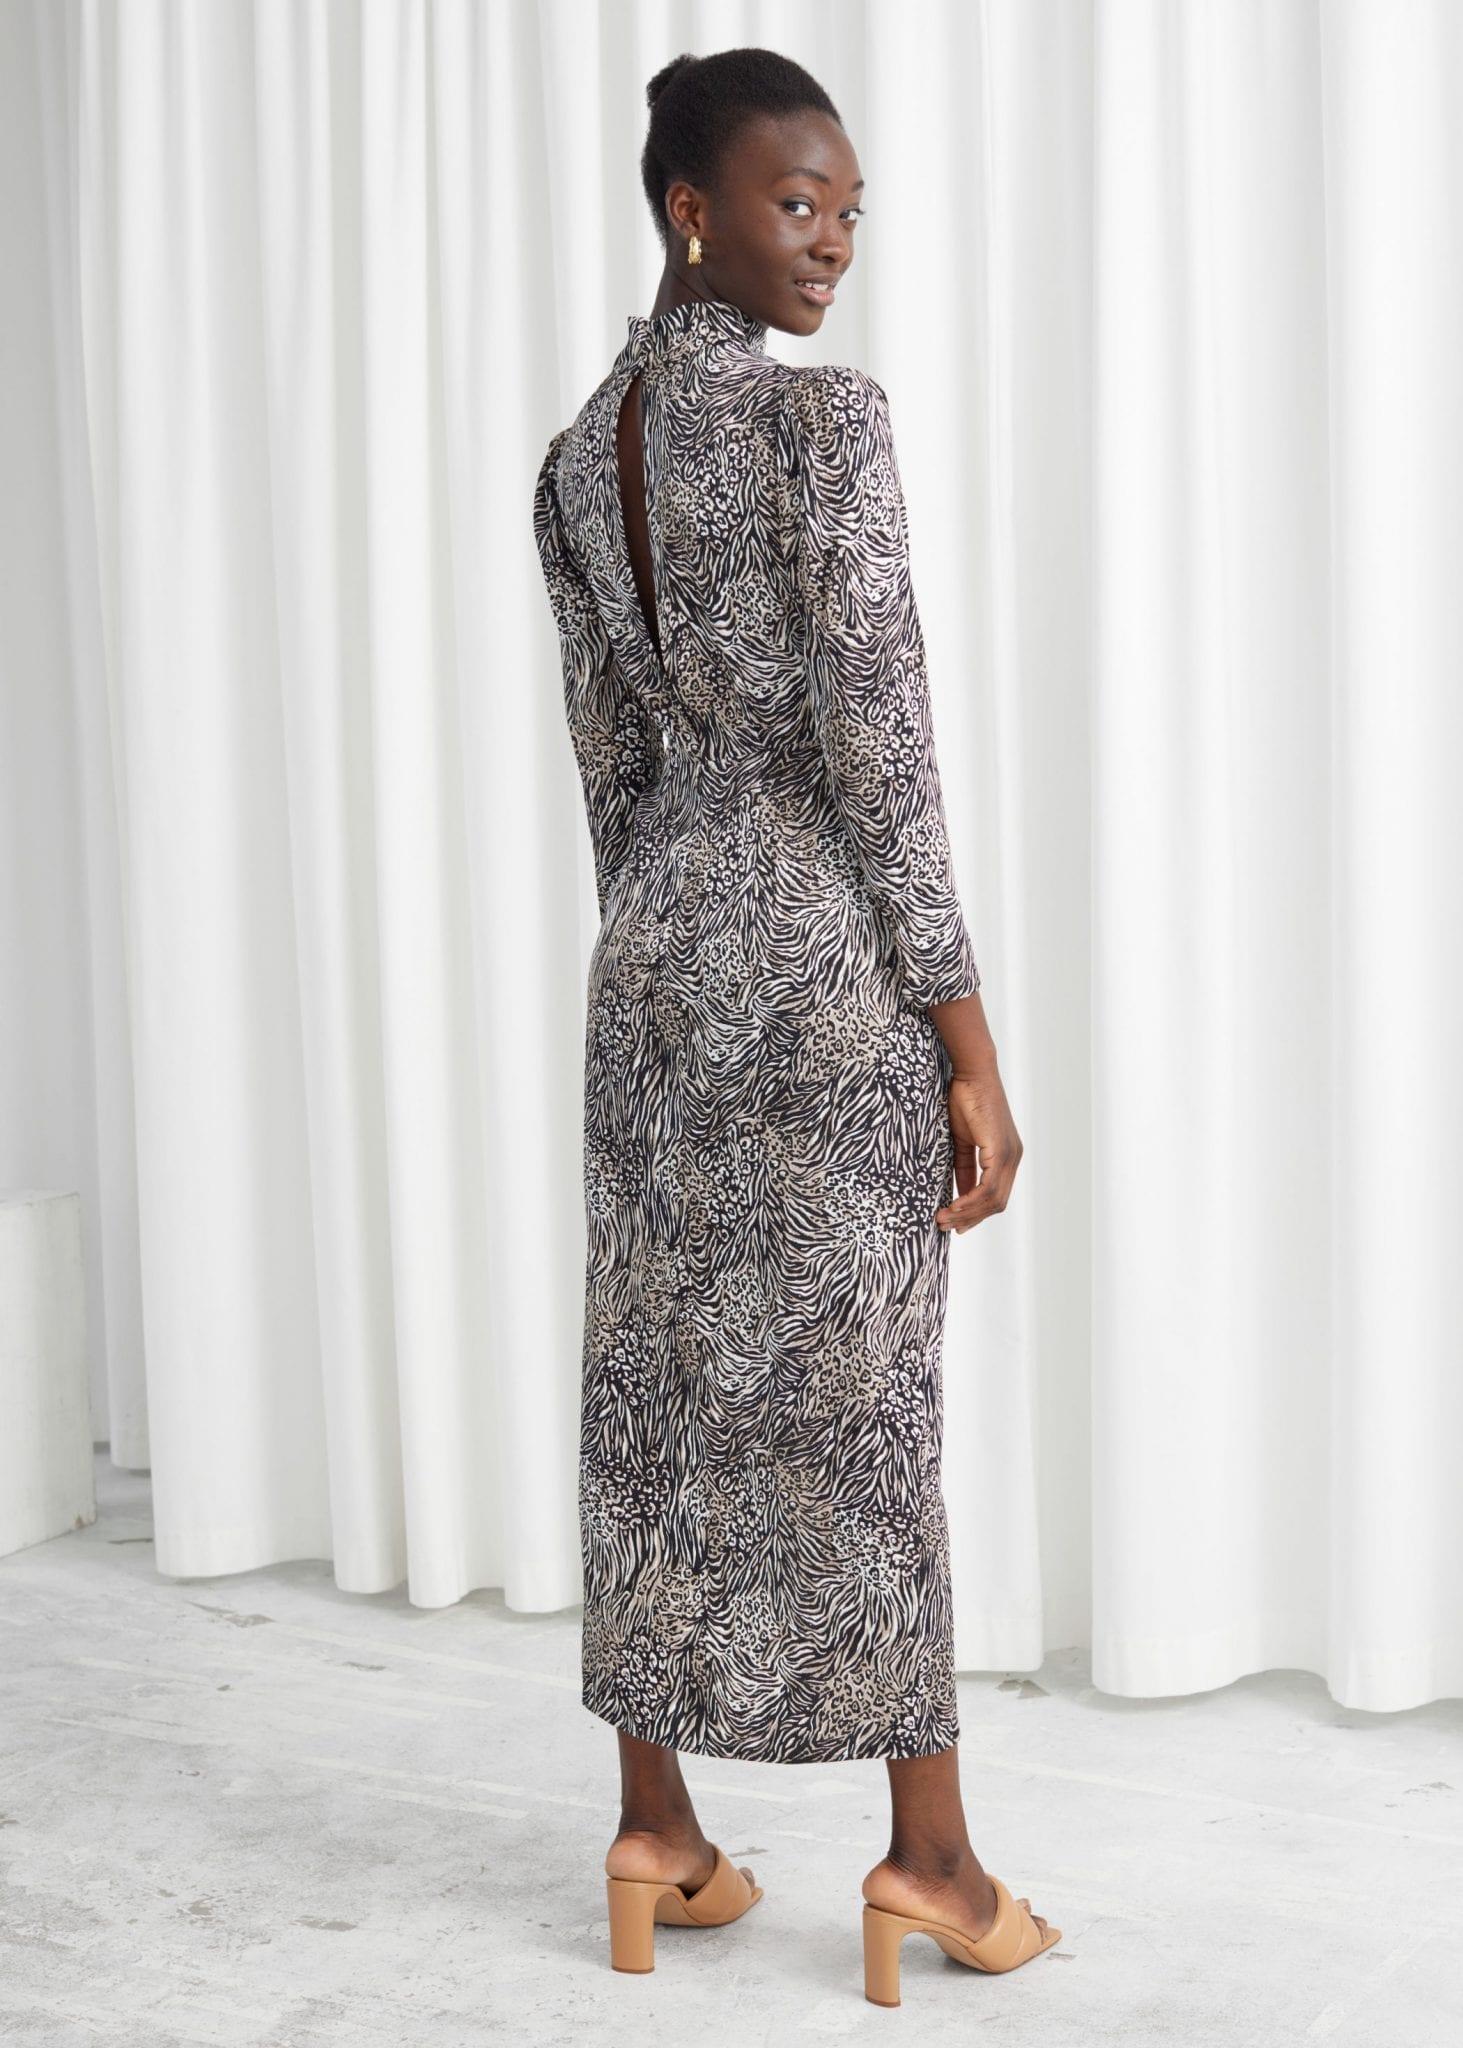 & OTHER STORIES Jacquard Puff Sleeve Midi Dress